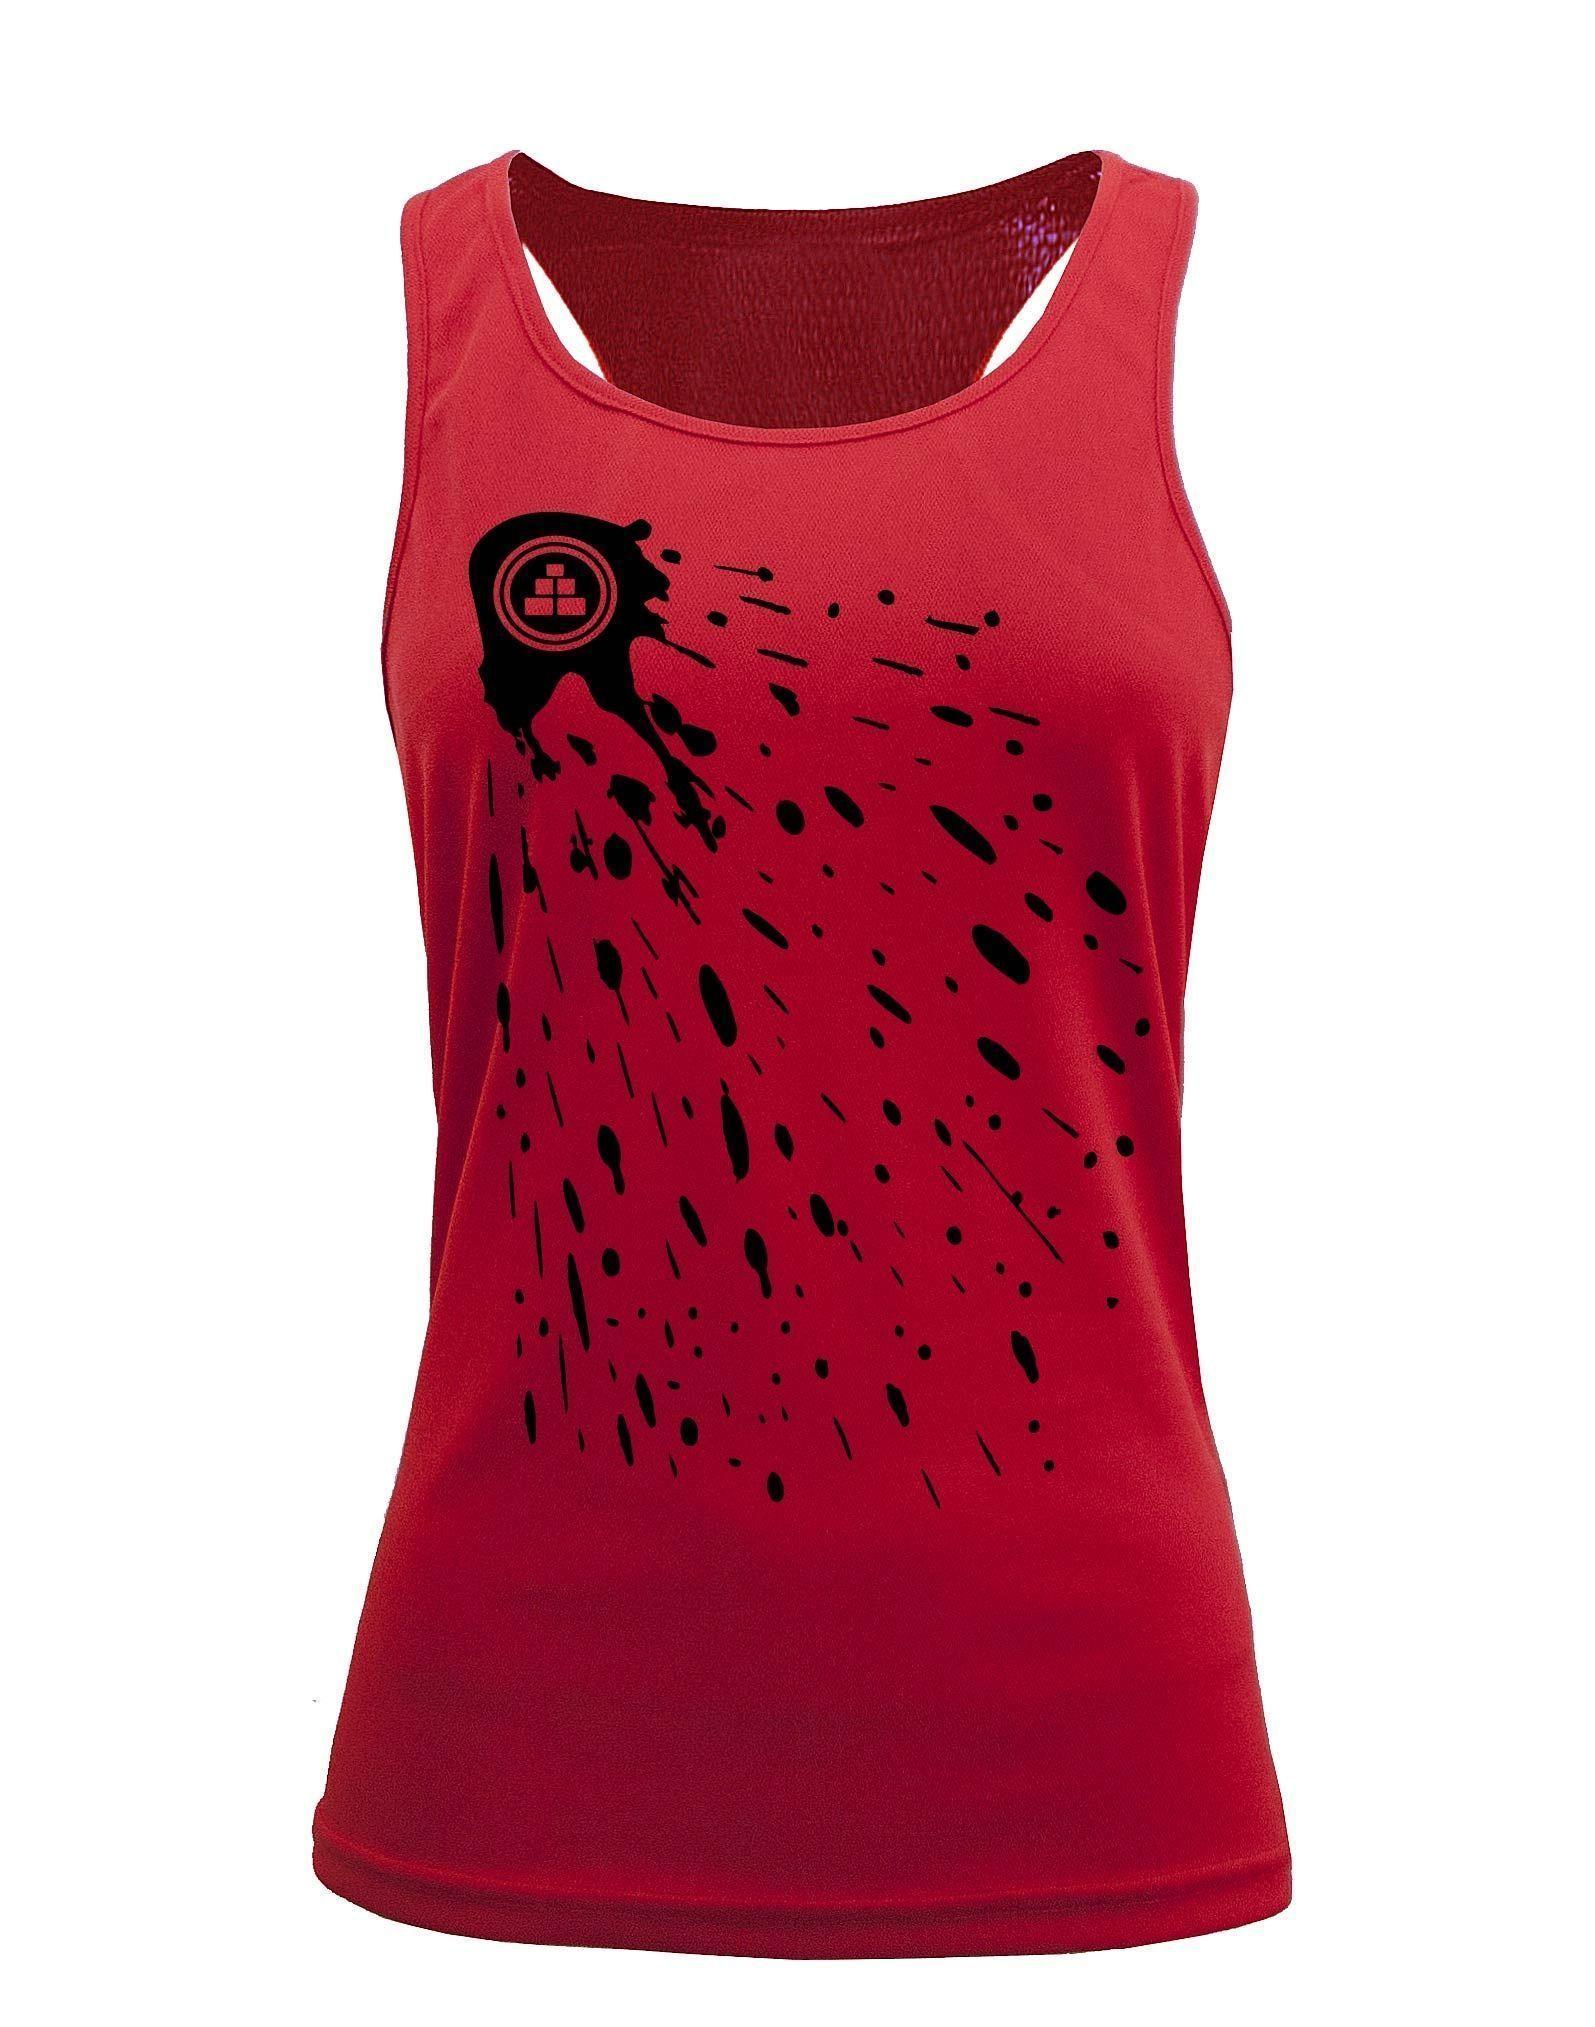 Camiseta fitness de tirantes Pintura Roja